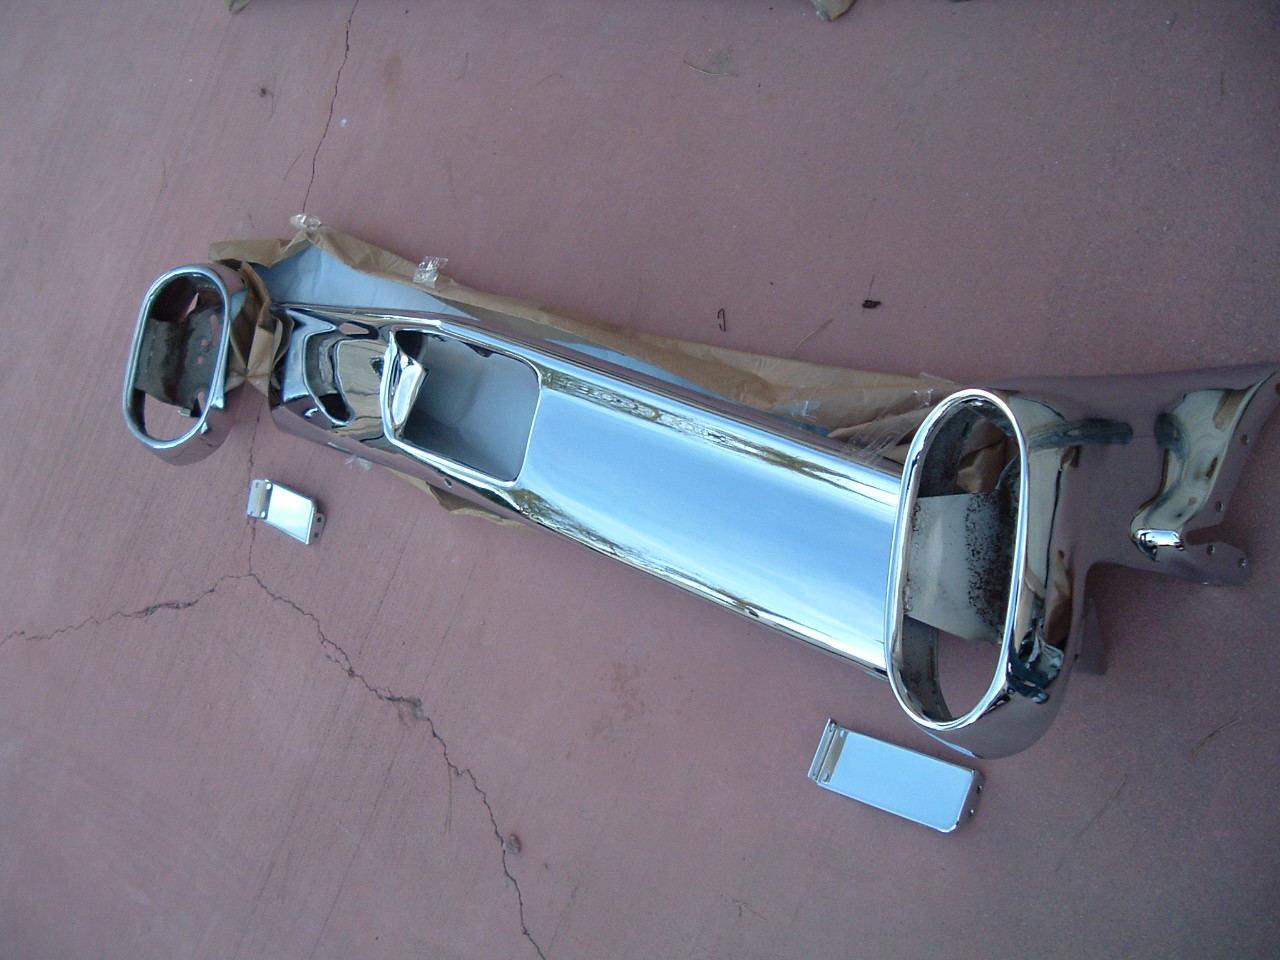 1960 cadillac rechromed rear bumper (z 1960 cad rear bumper)